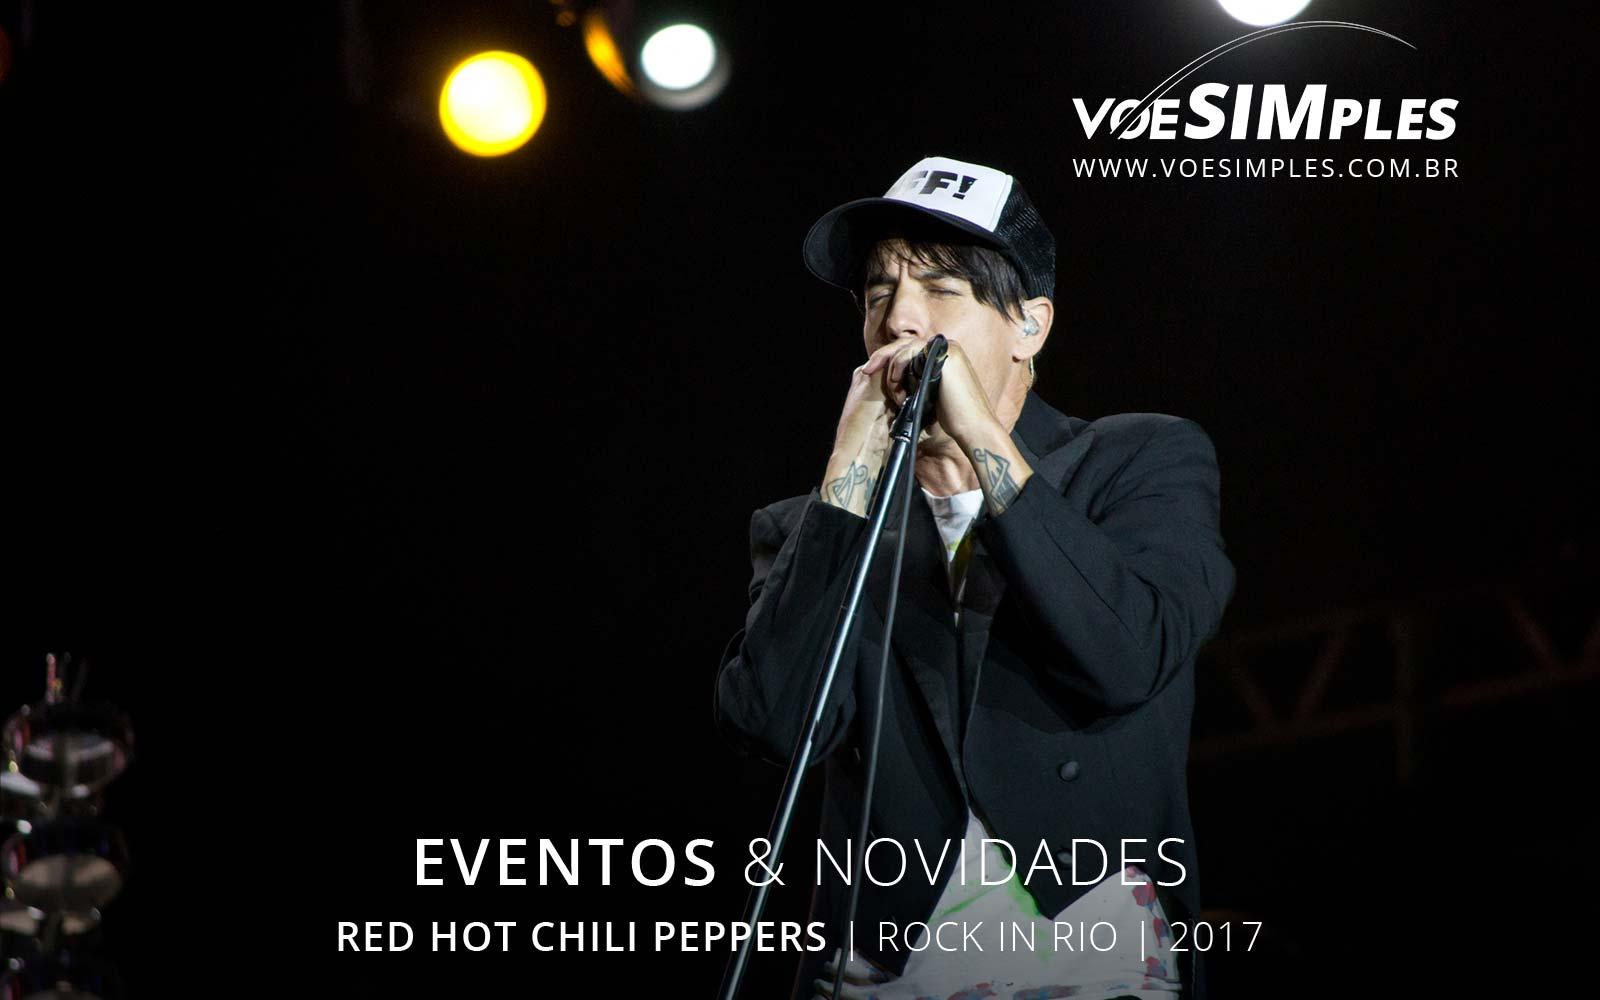 fotos-rock-rio-red-hot-rio-janeiro-2017-voesimples-passagem-aerea-promocional-red-hot-promocao-passagens-aereas-red-hot-2017-02